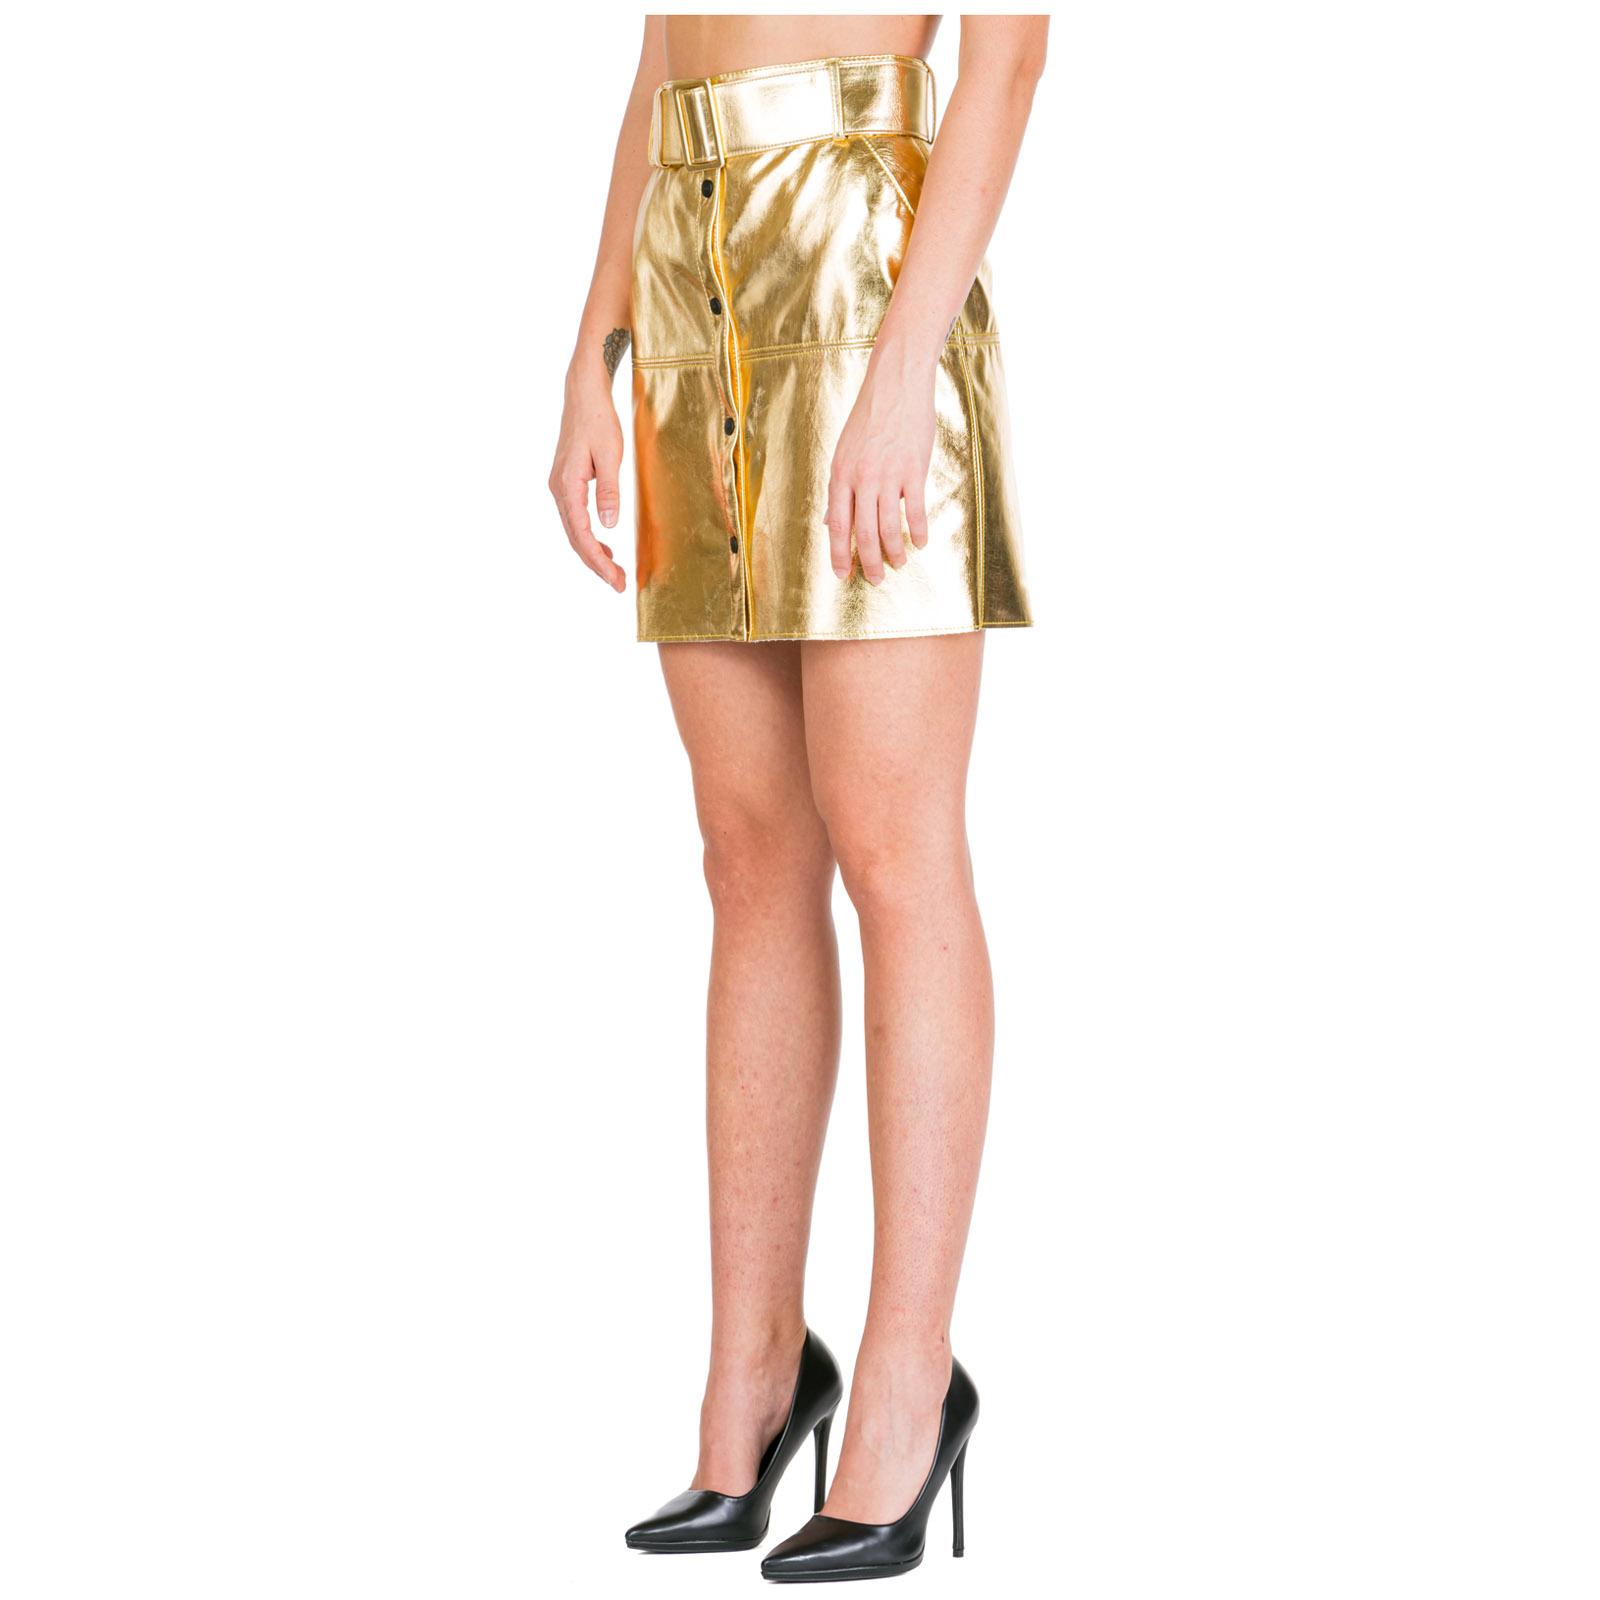 Minifalda de mujer falda corta